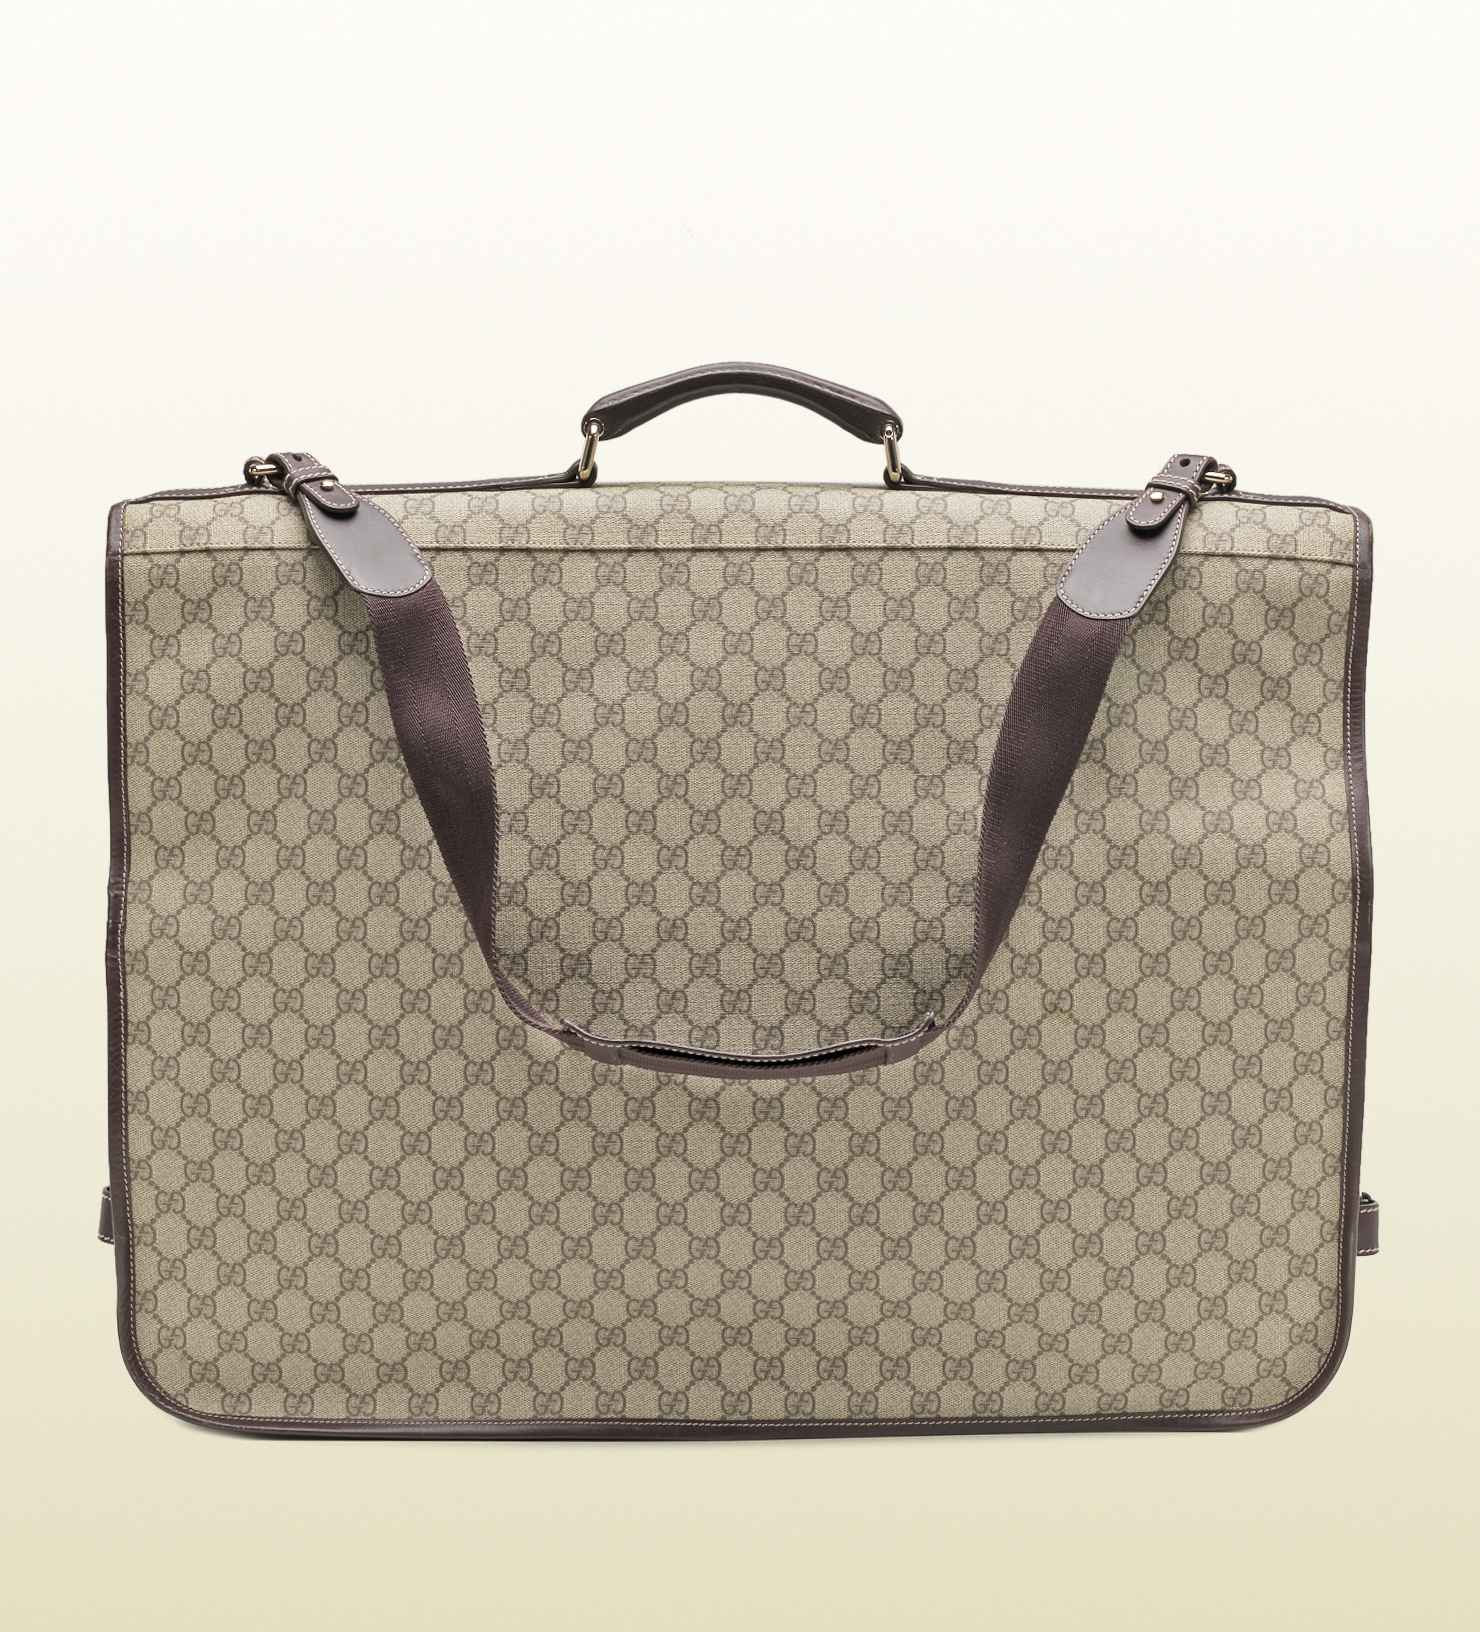 gucci gg supreme canvas garment bag in beige gray for